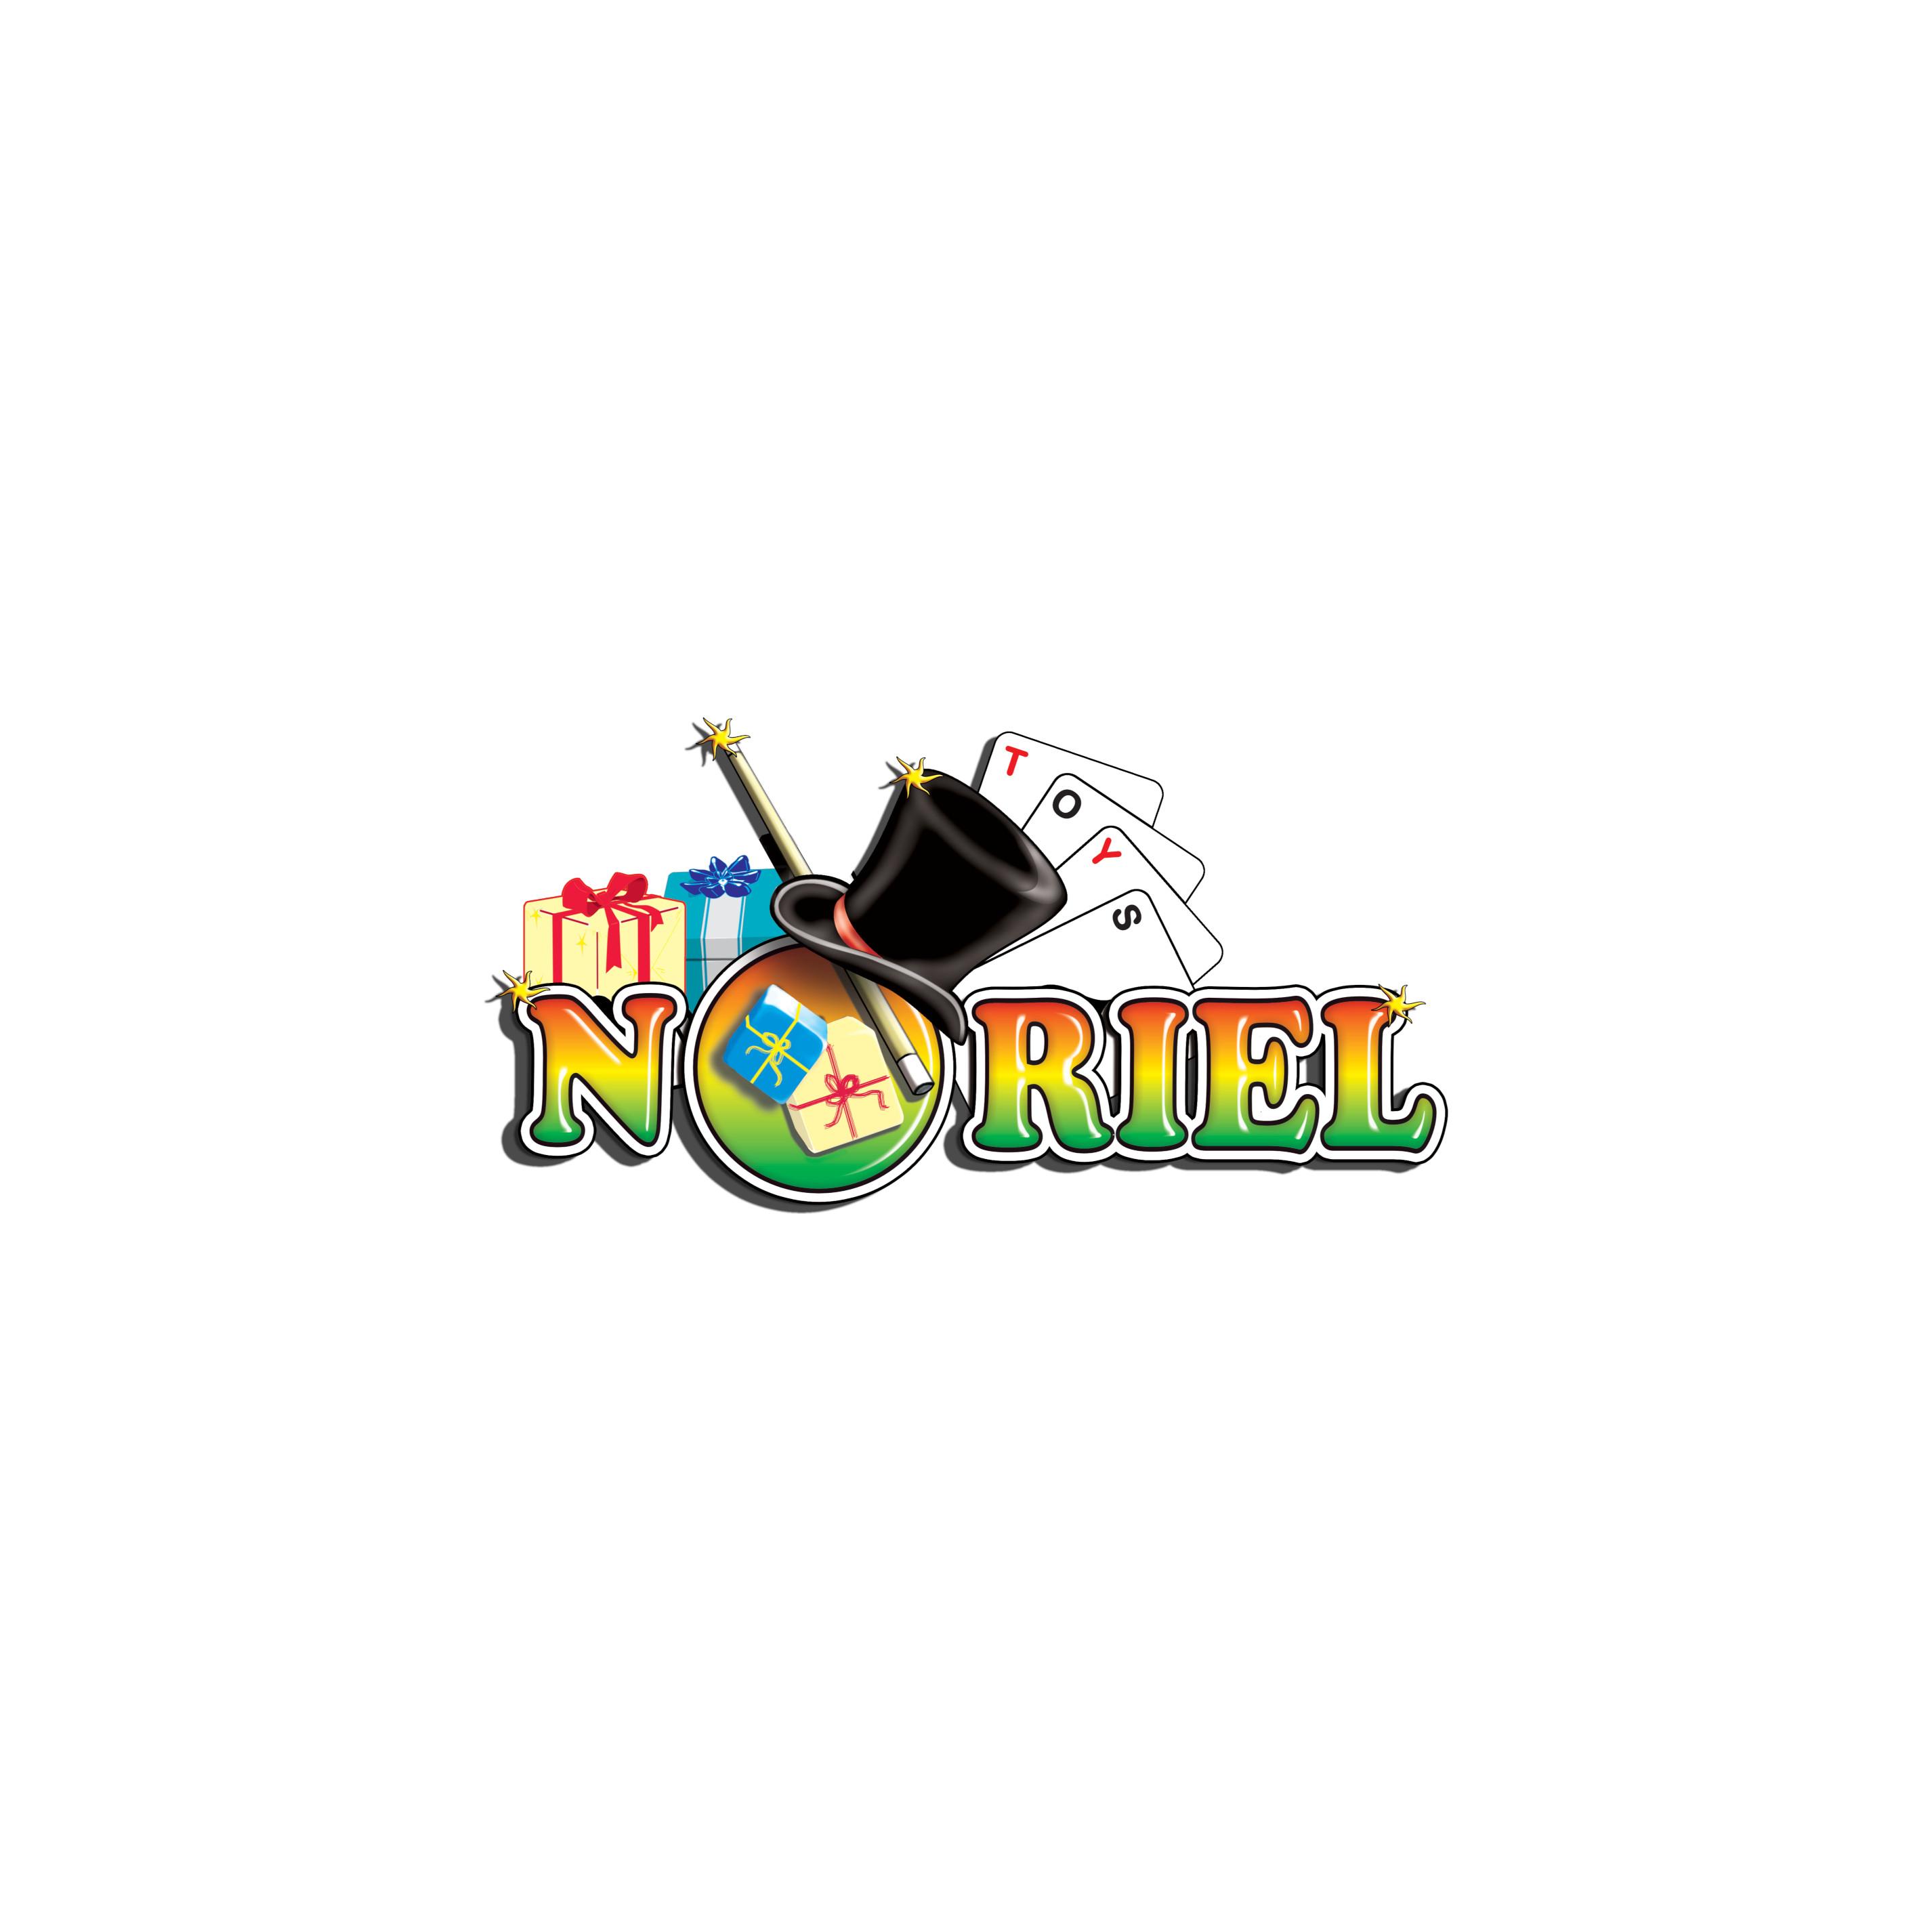 DK000041198_001w Carnetel cu 96 de file, Mood